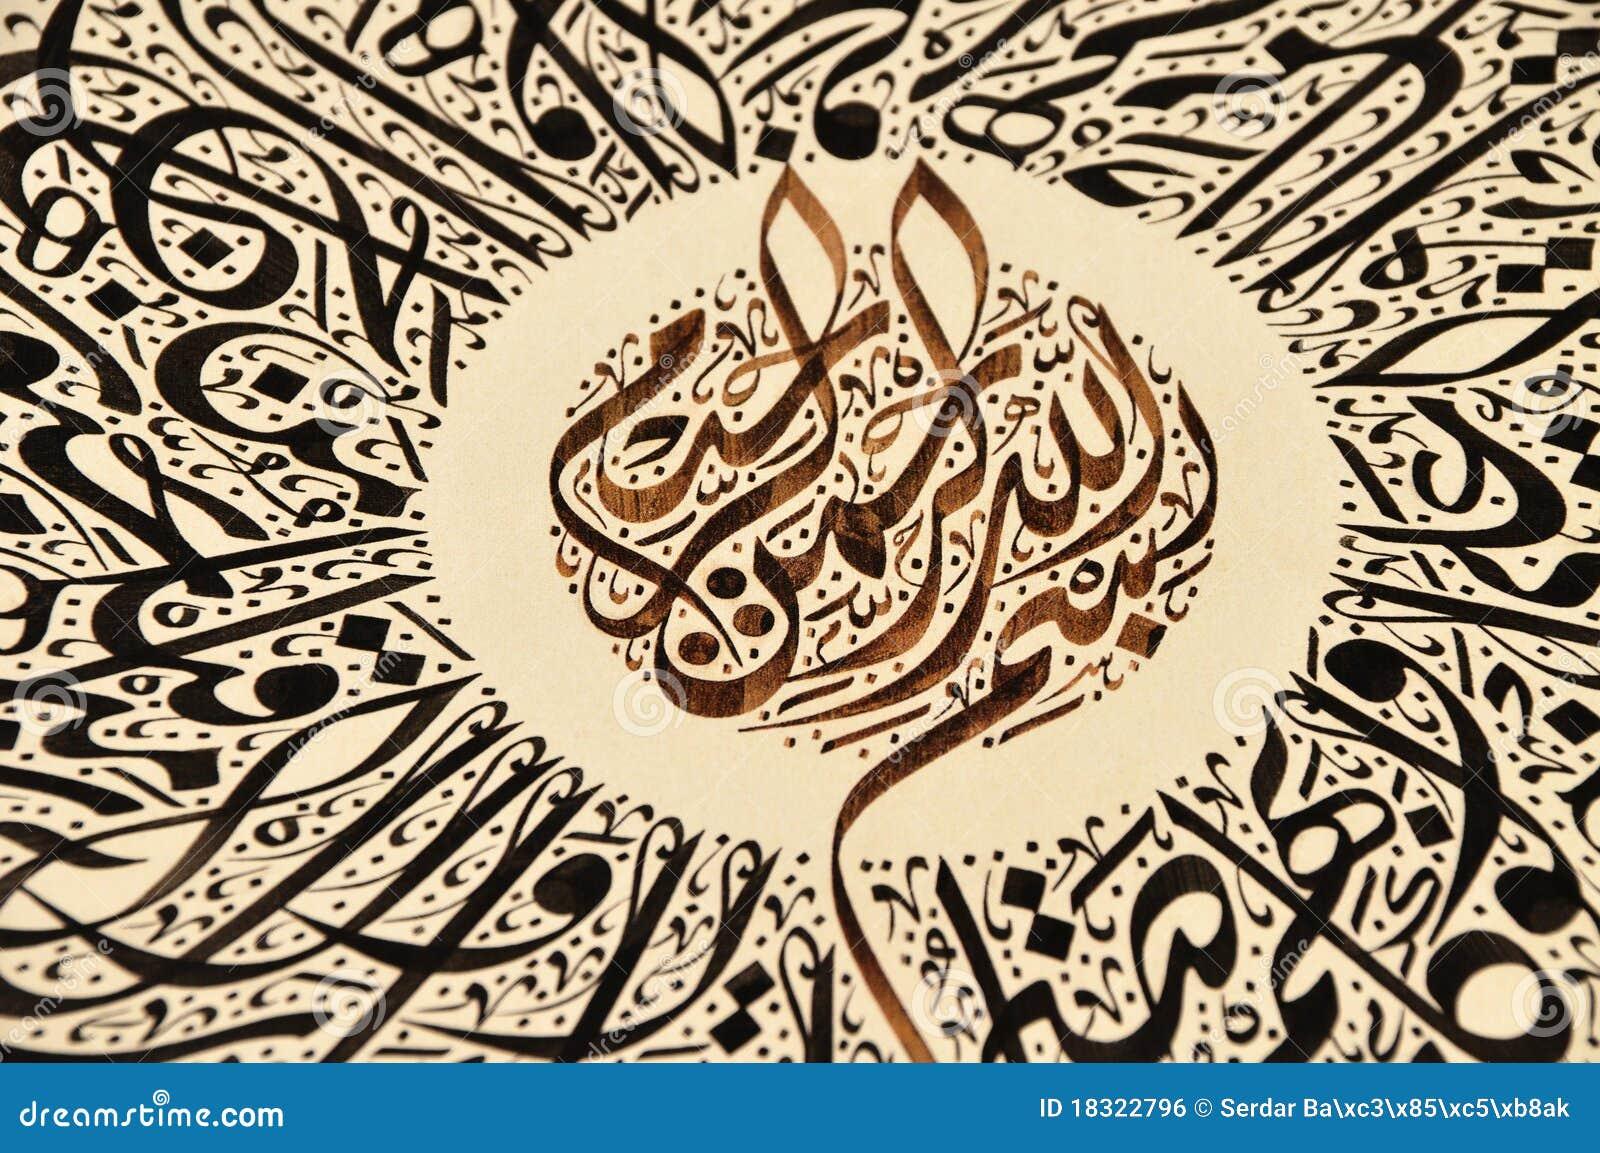 Islamic Calligraphy Royalty Free Stock Image Image 18322796